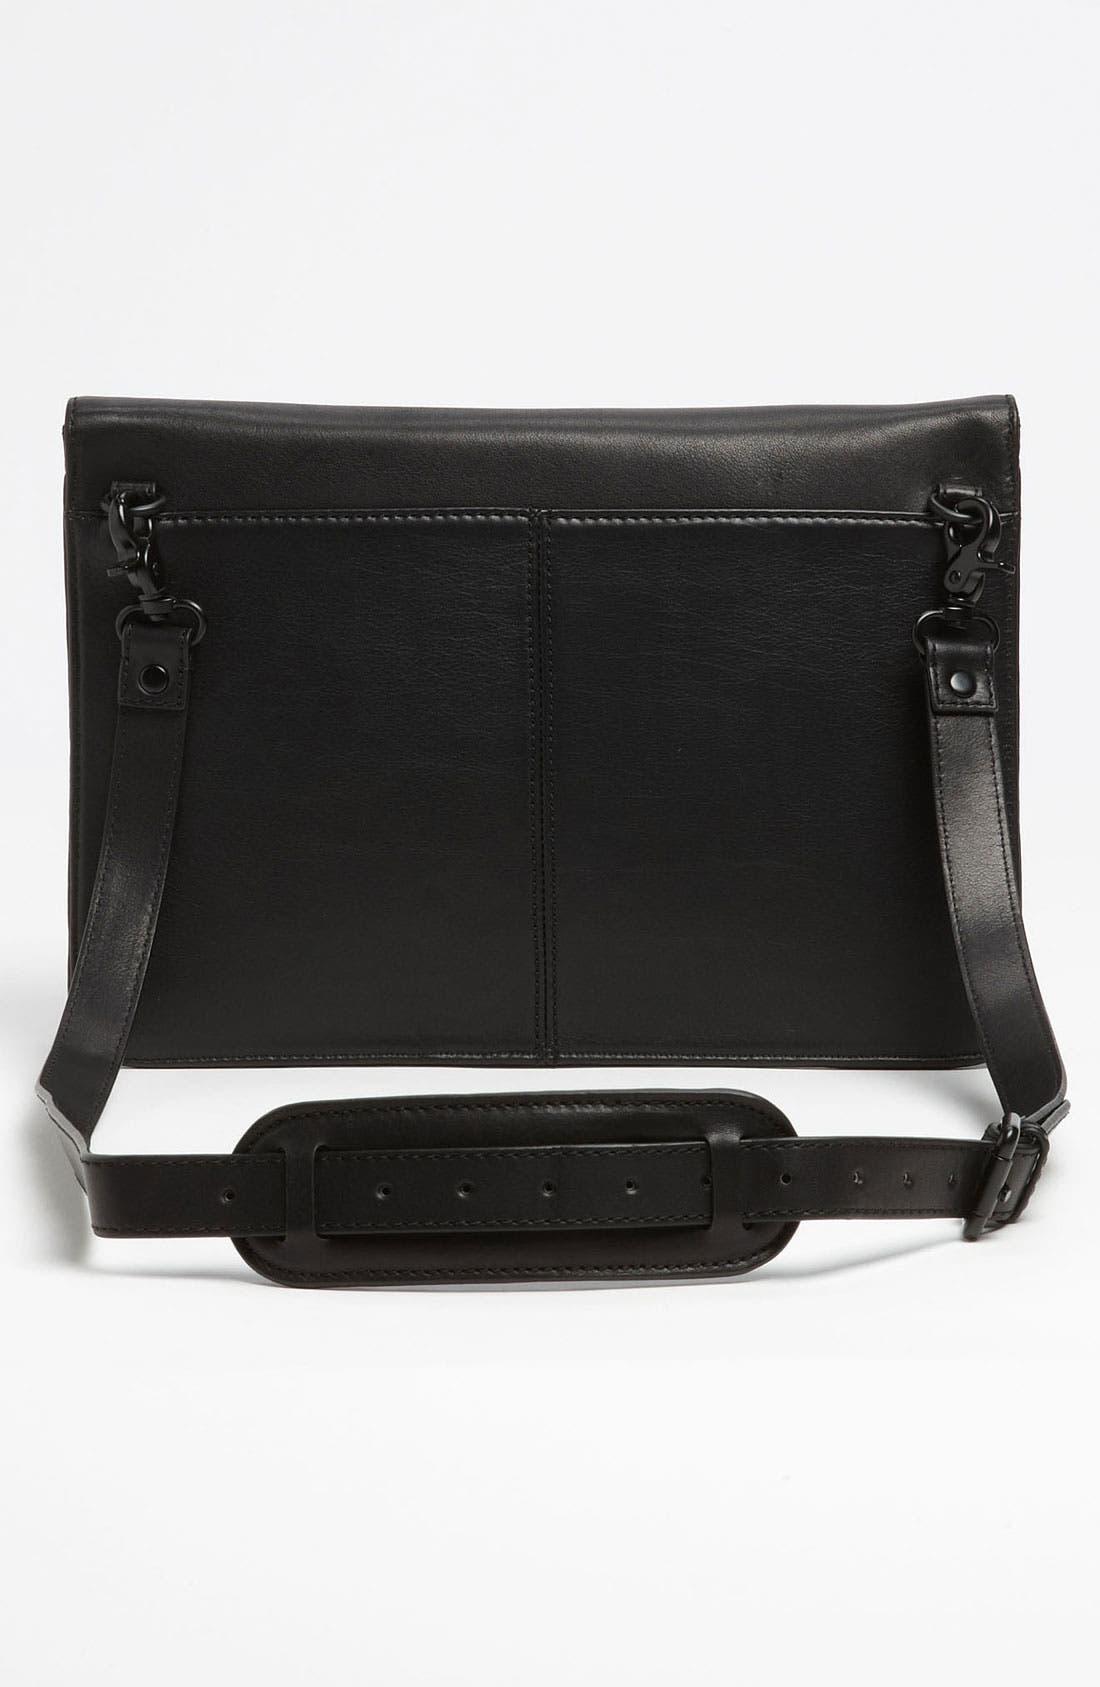 Ben Minkoff 'Mark' Laptop Bag,                             Alternate thumbnail 4, color,                             001